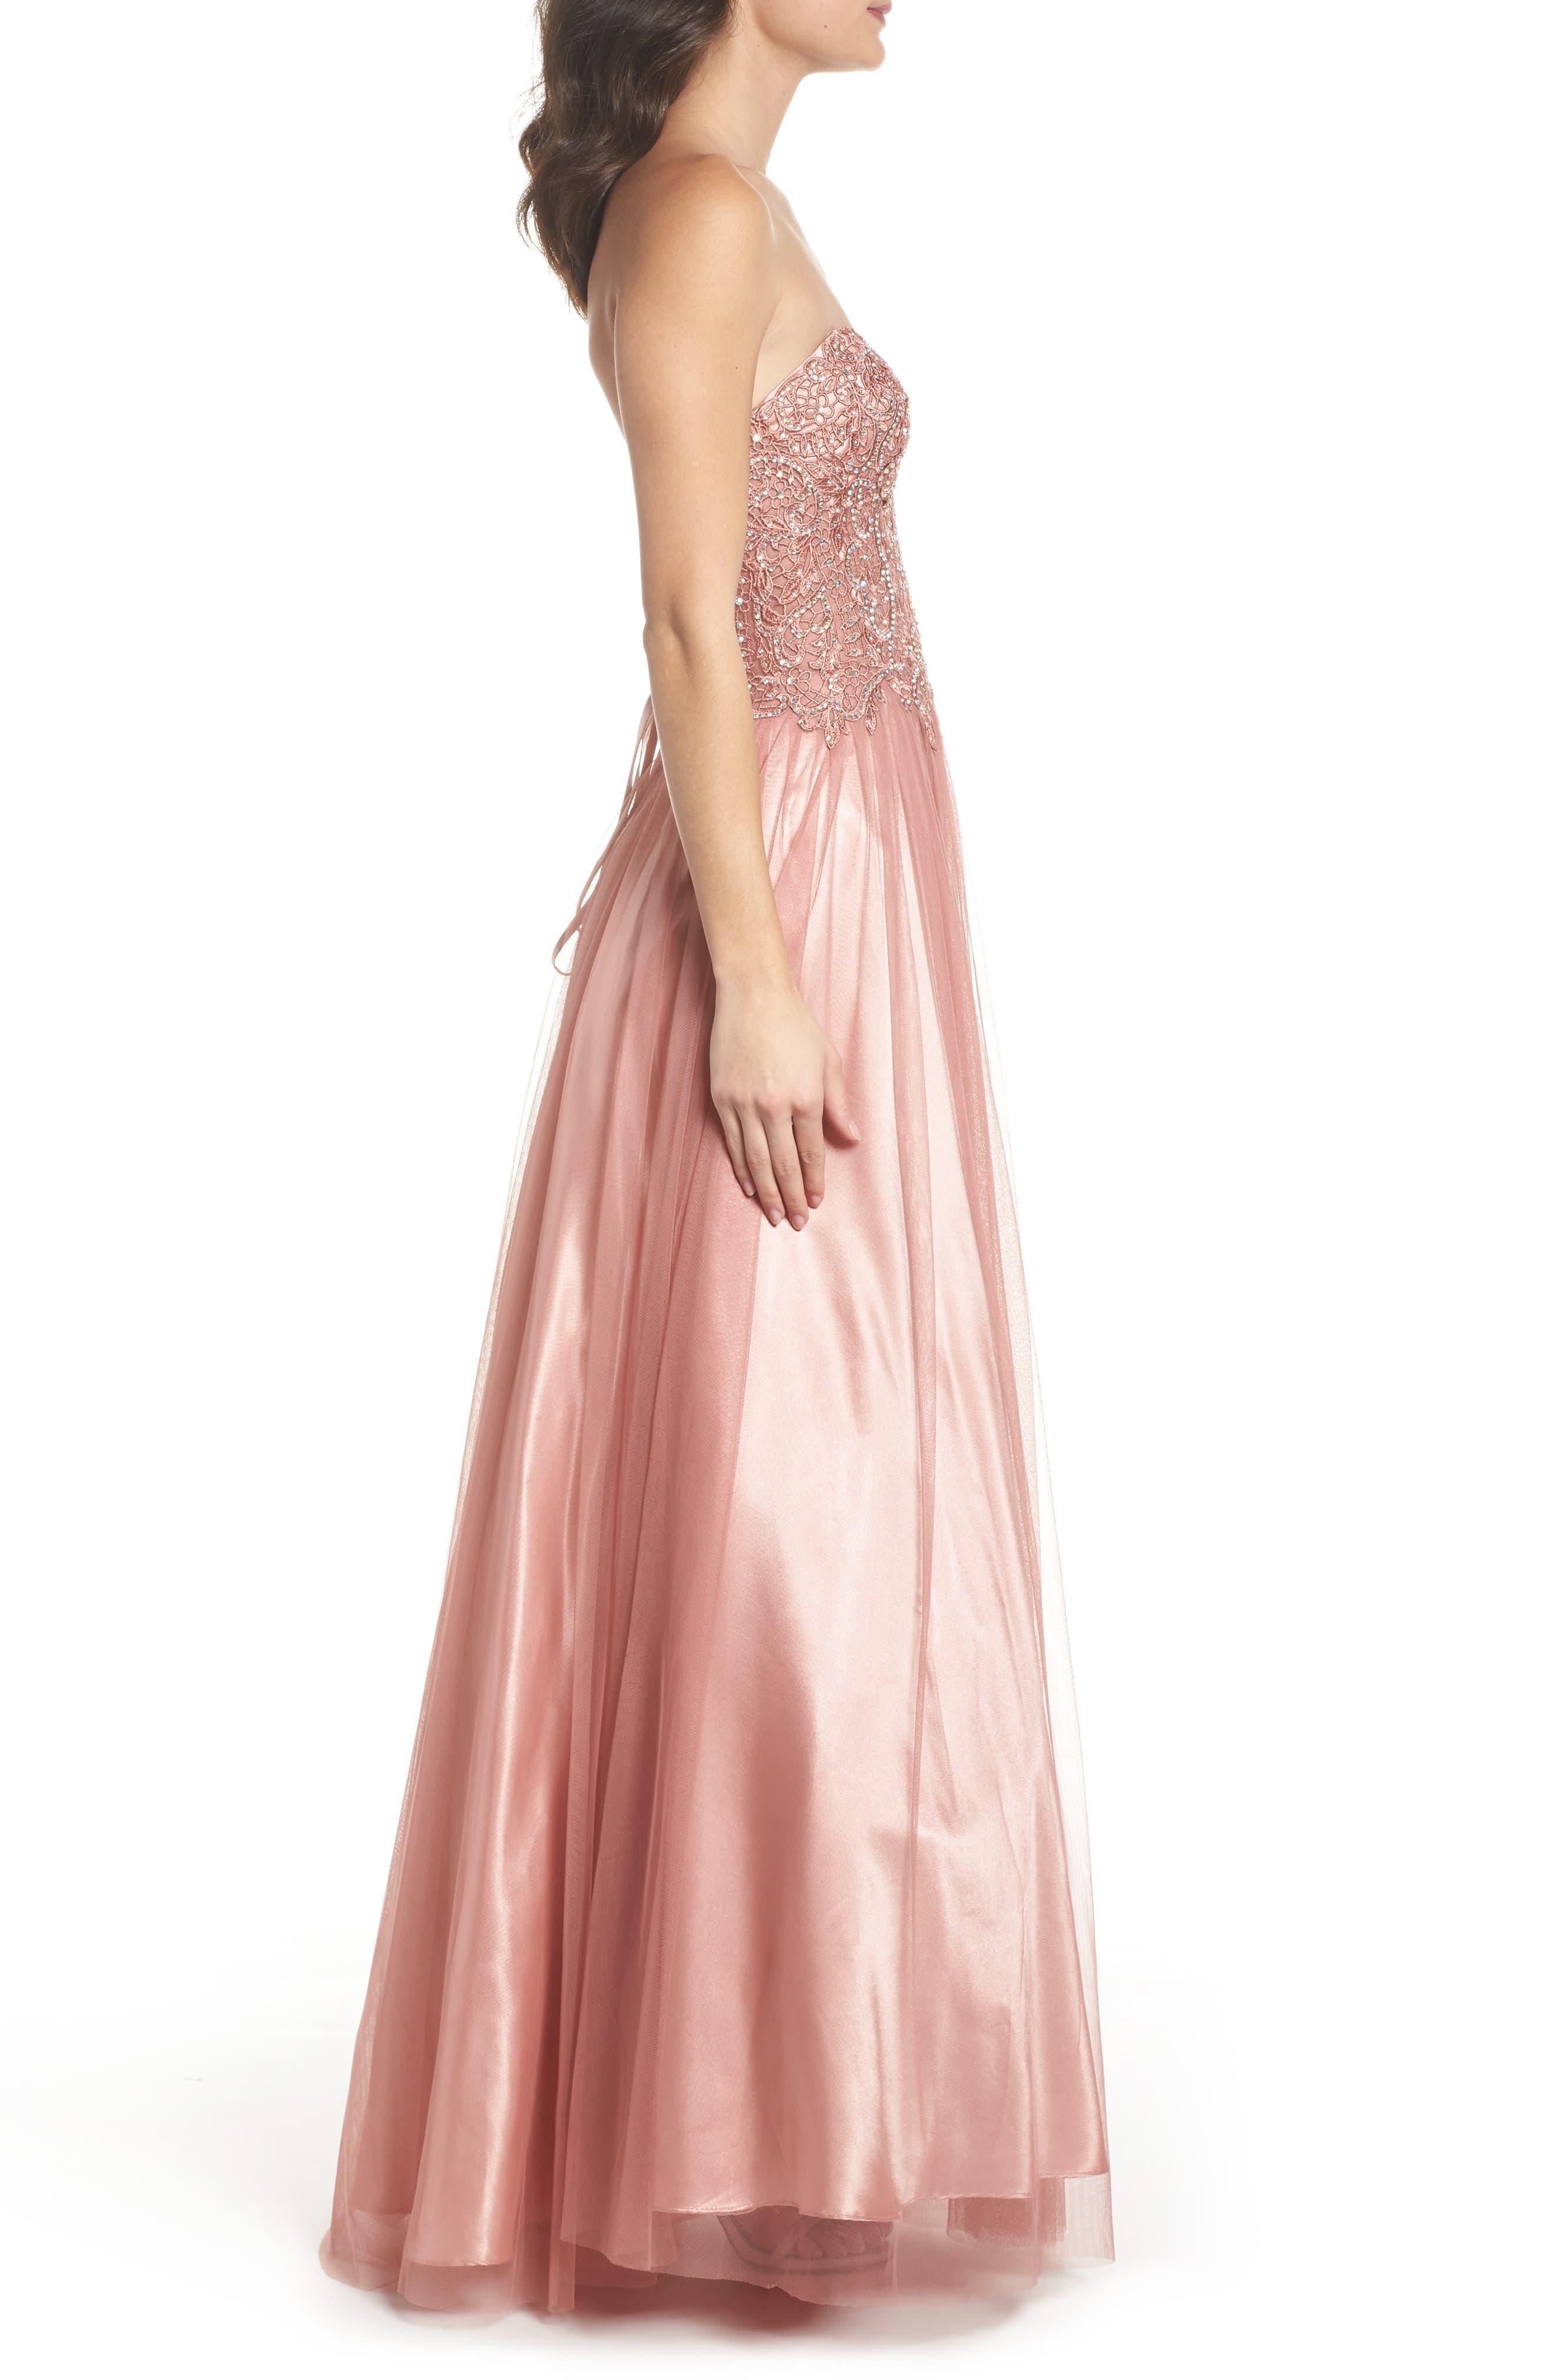 Embellished Corset Ballgown,                             Alternate thumbnail 3, color,                             Rose